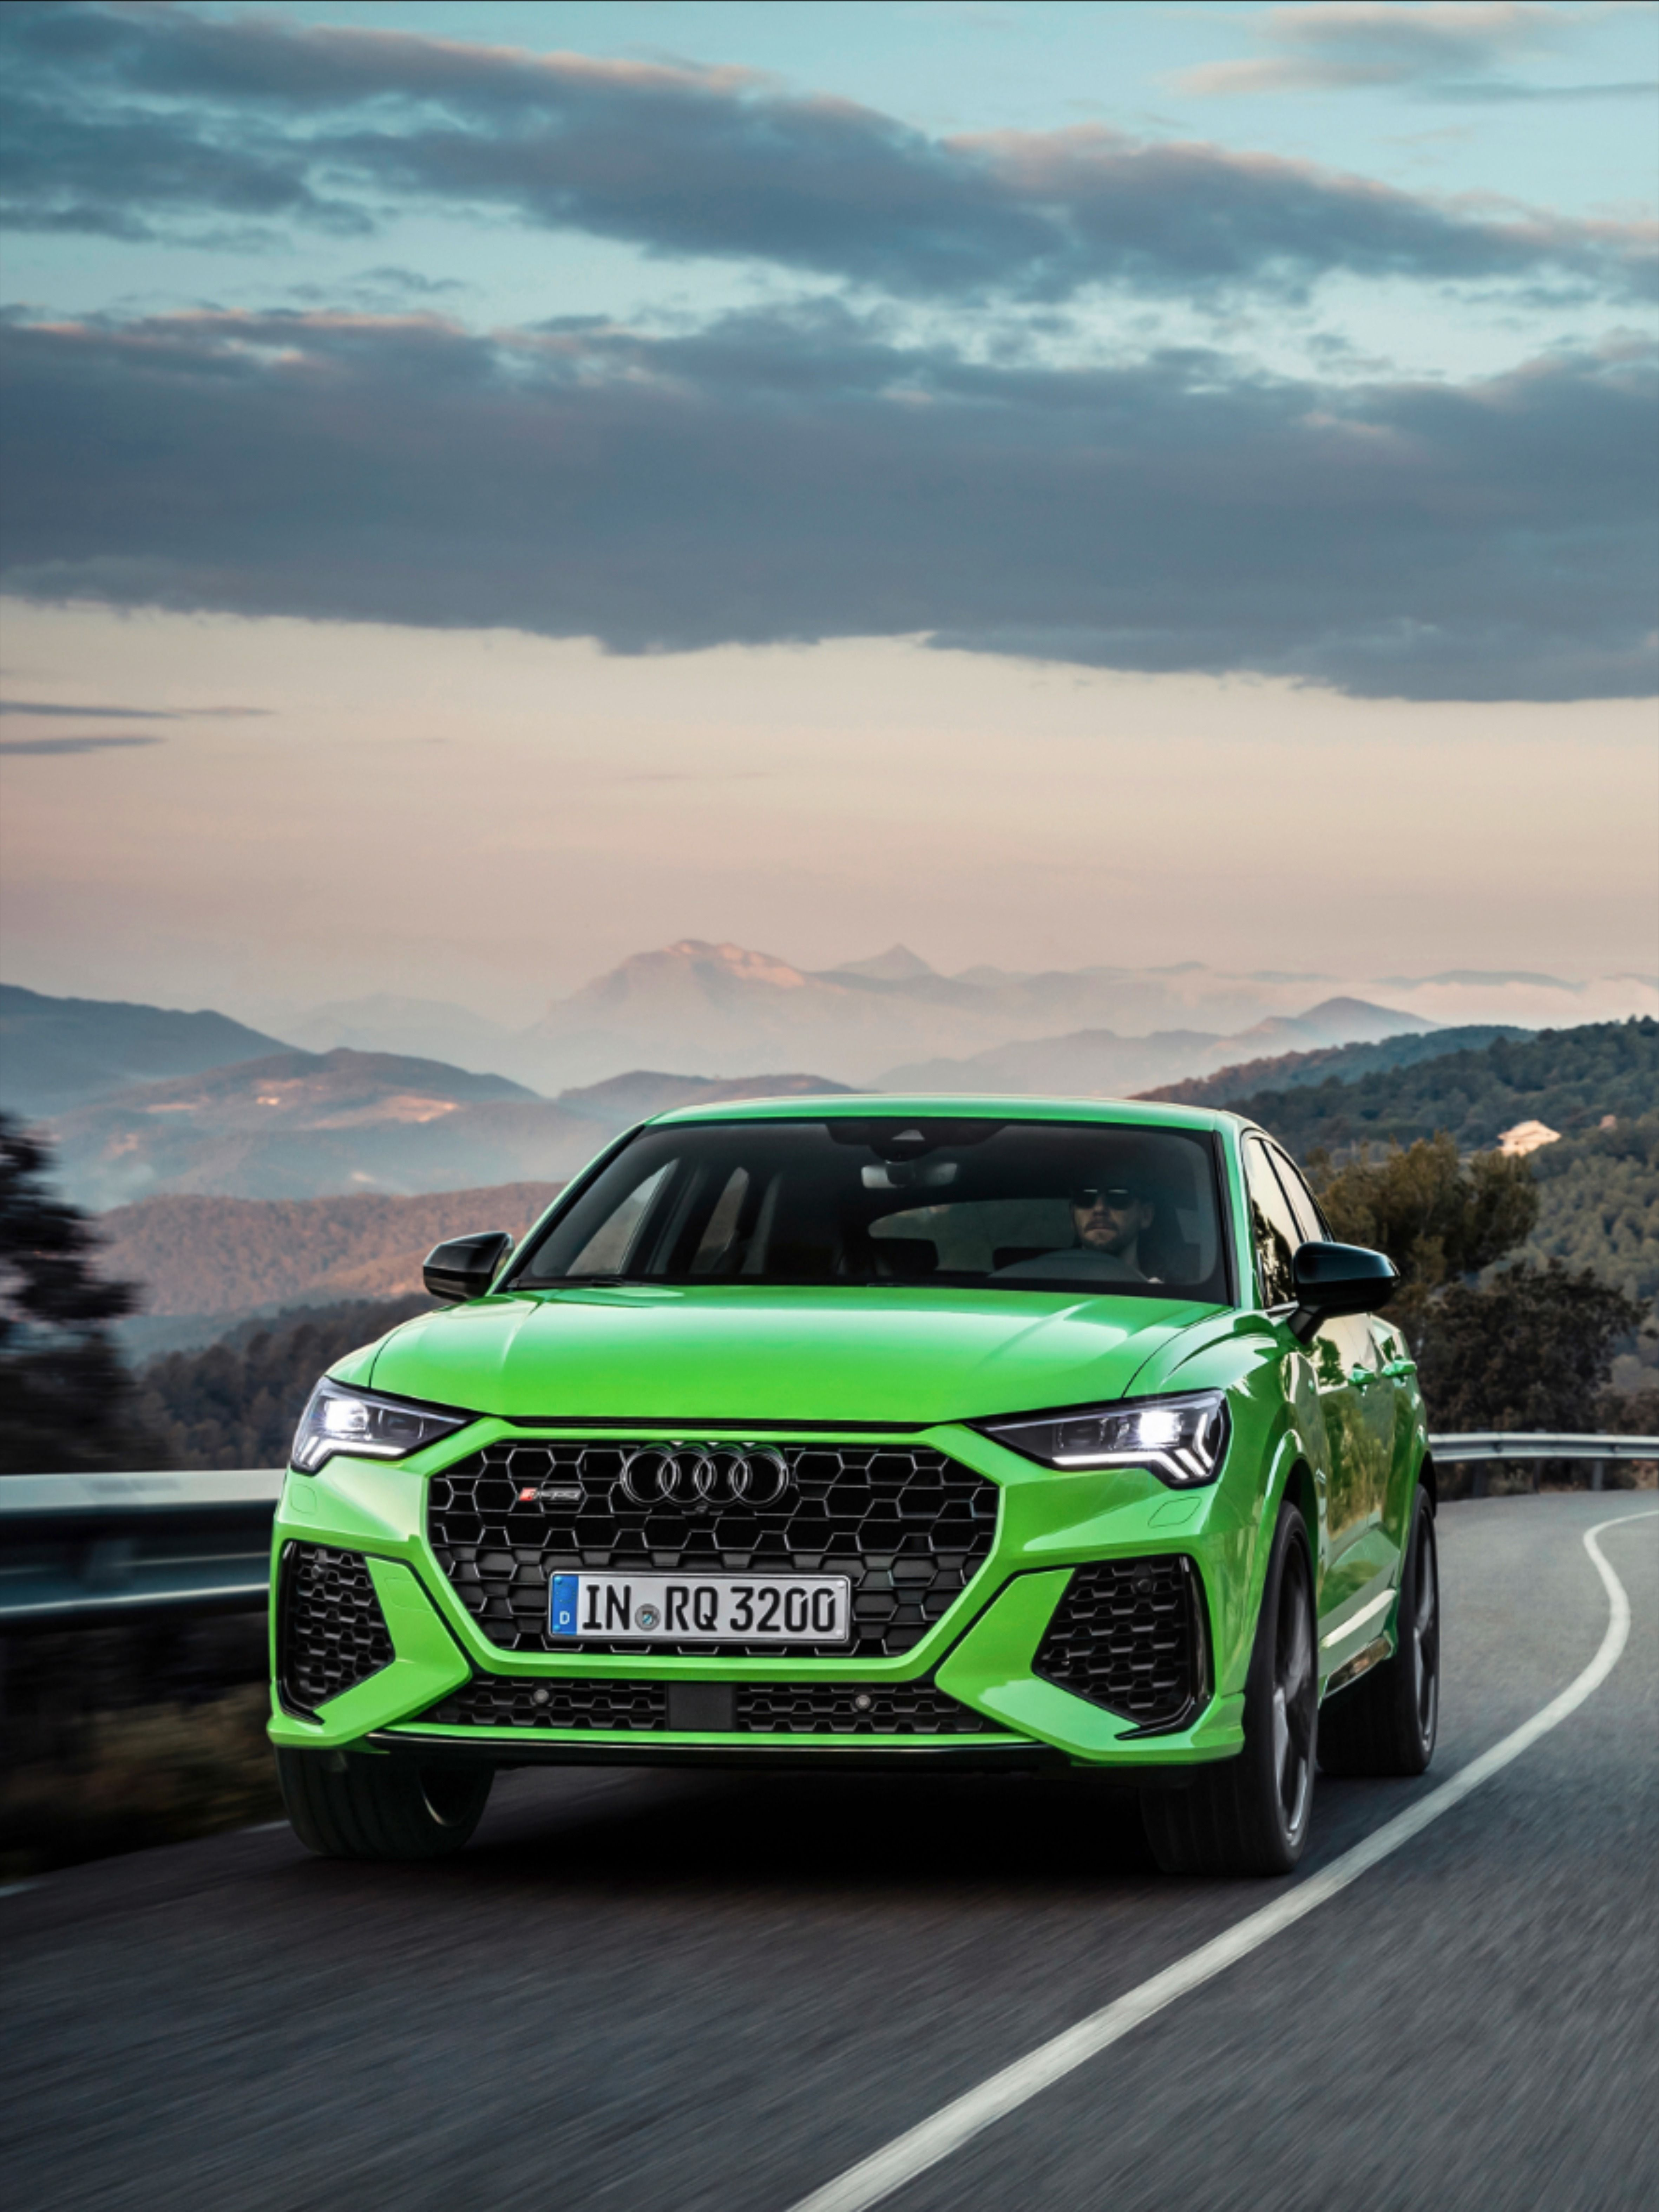 Audi Rs Q3 Sportback 2019 In 2020 Audi Rs Audi Sportback Audi